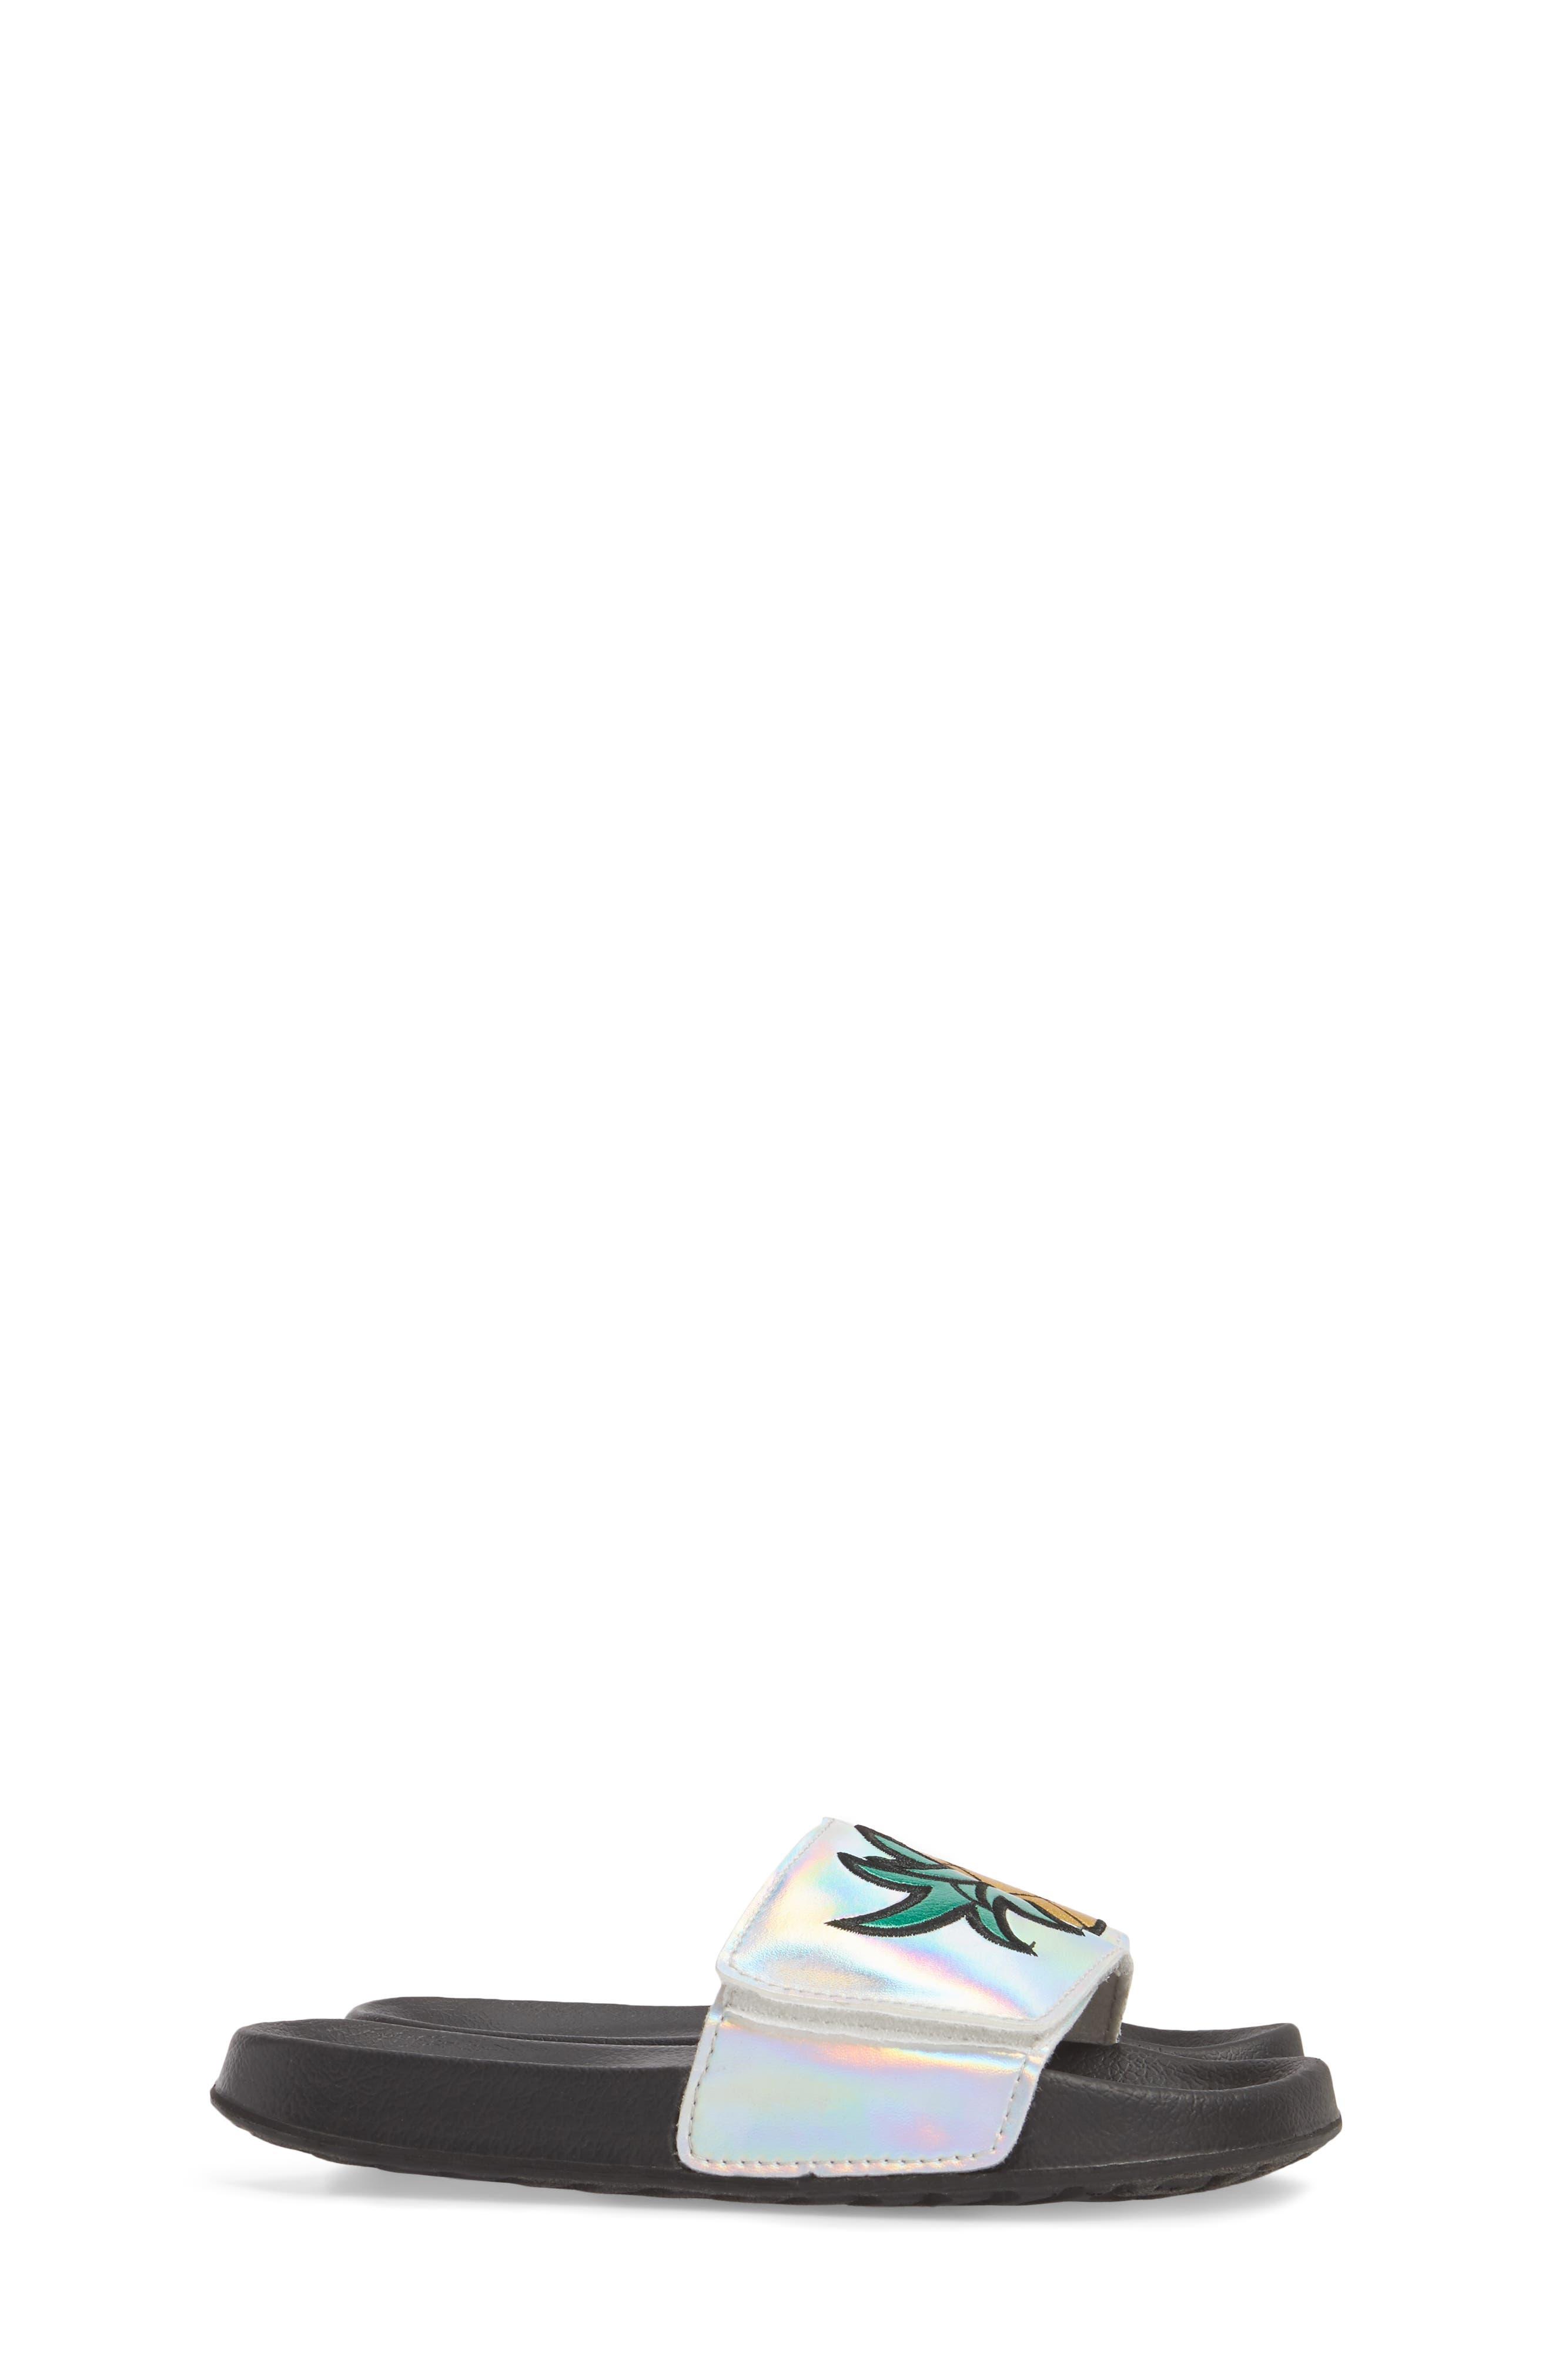 Mackie Pineapple Metallic Slide Sandal,                             Alternate thumbnail 4, color,                             040